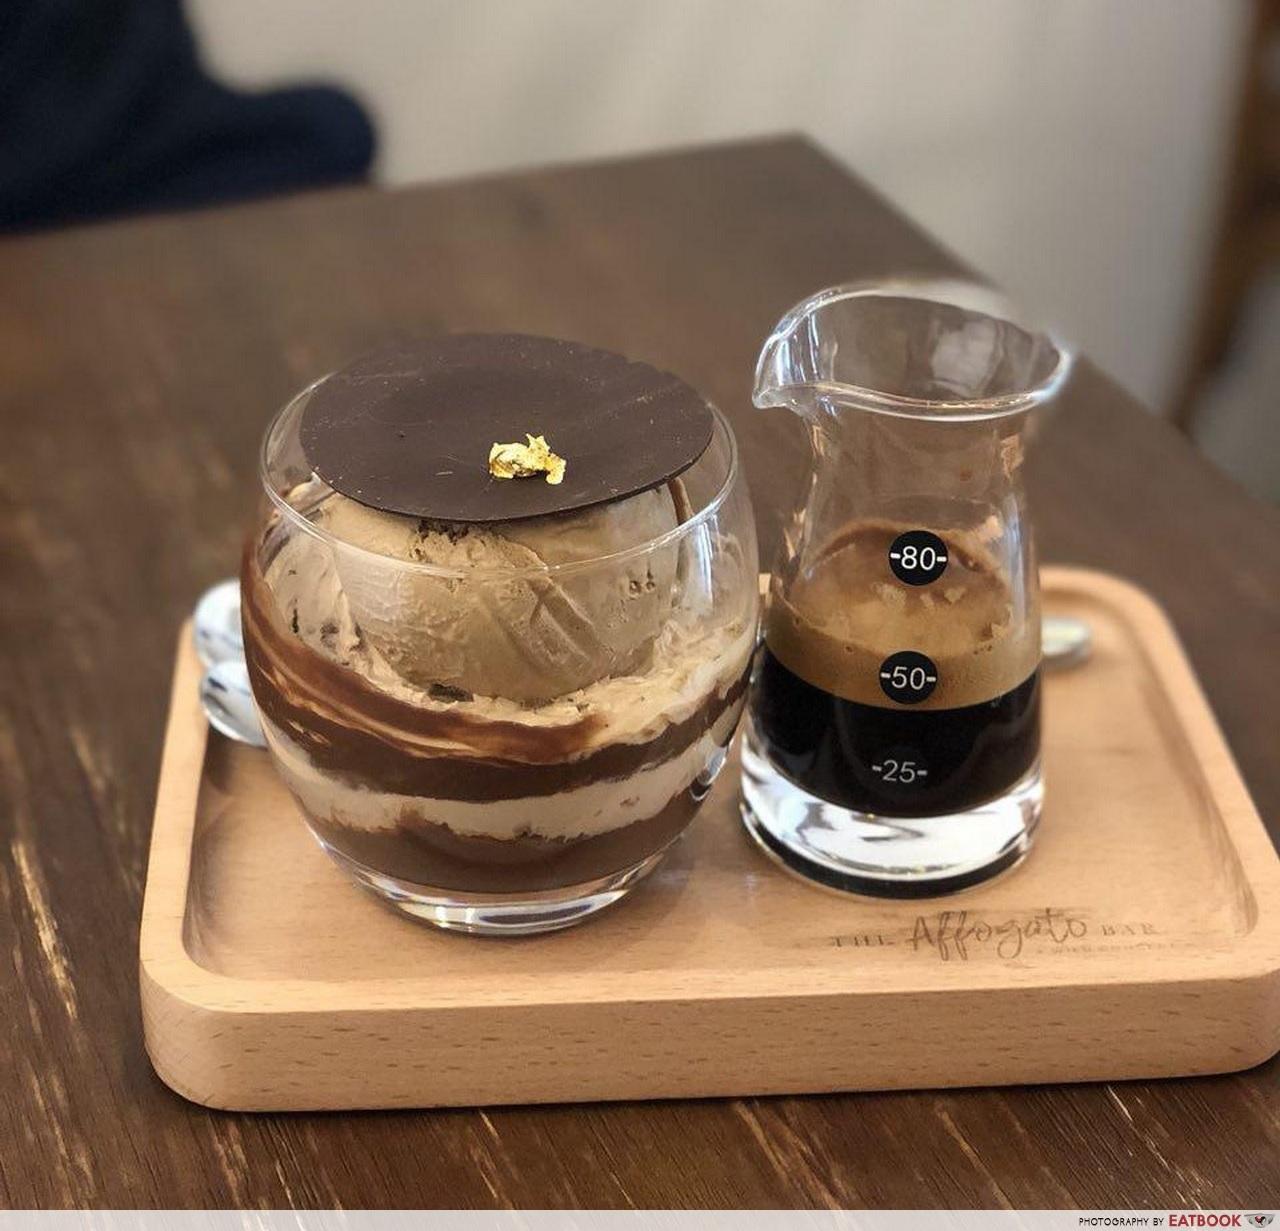 Romantic Cafes - La Opera